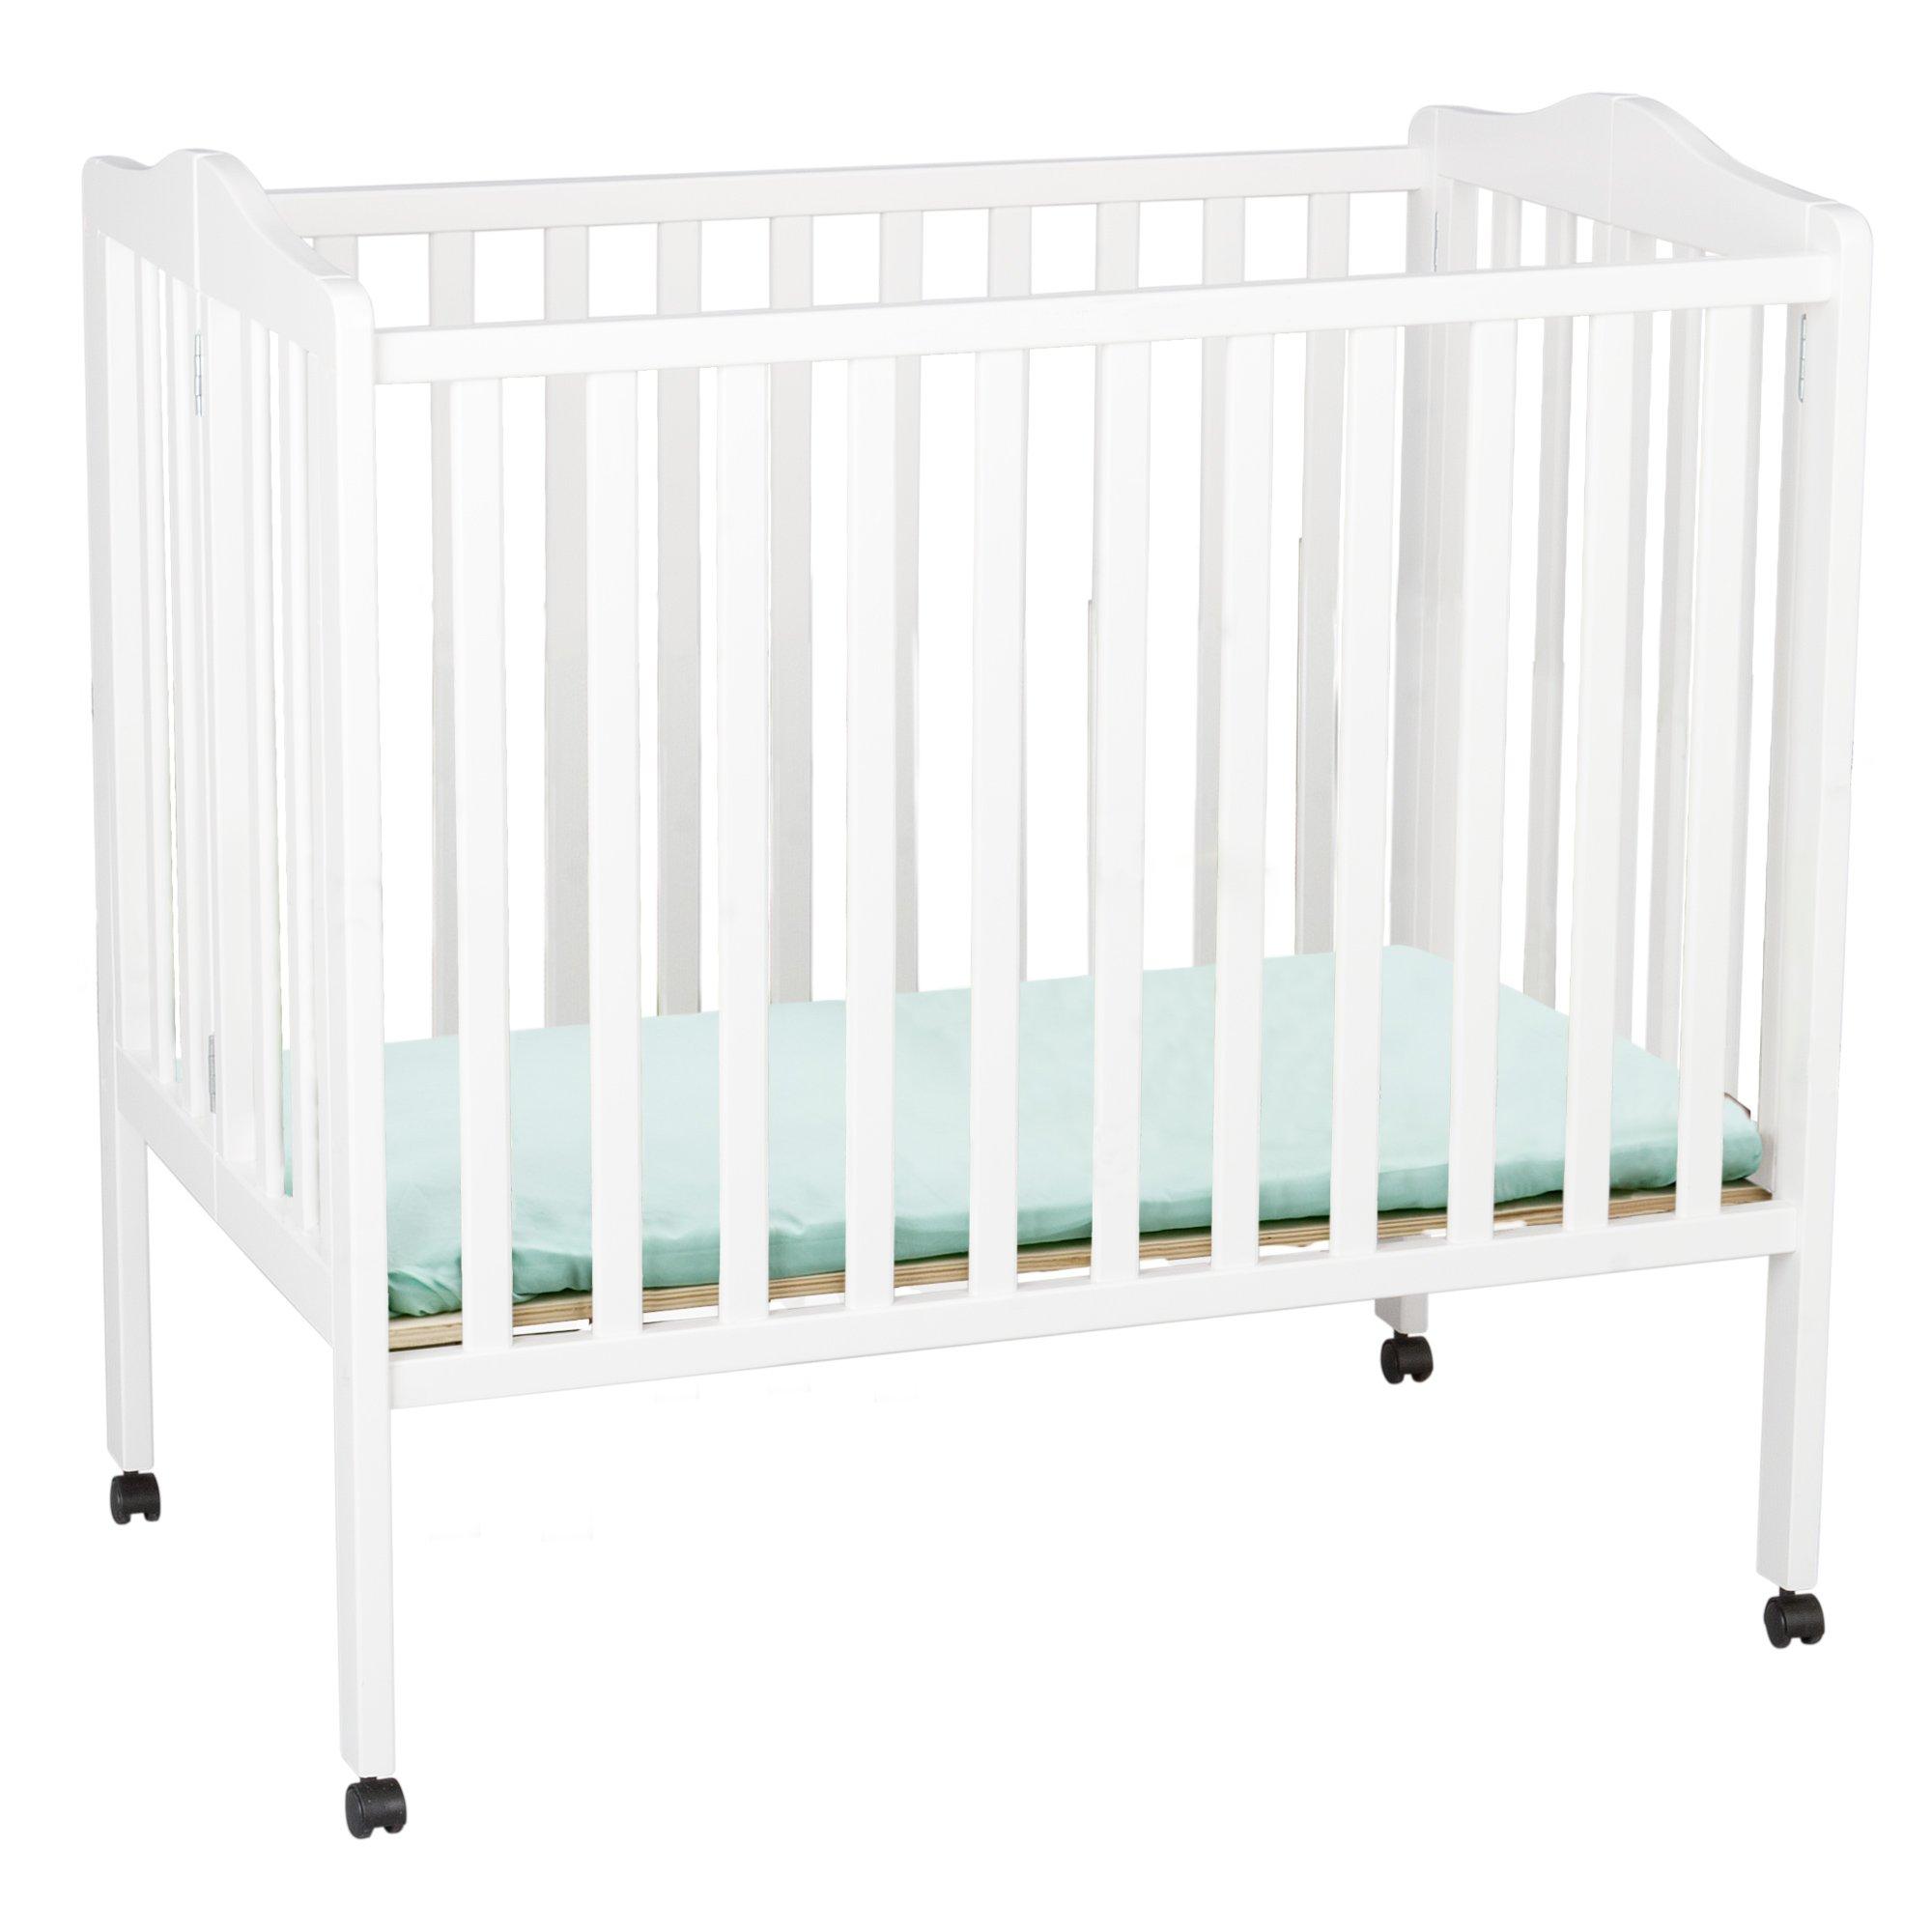 Delta Children Folding Portable Mini Crib with Mattress, White by Delta Children (Image #1)